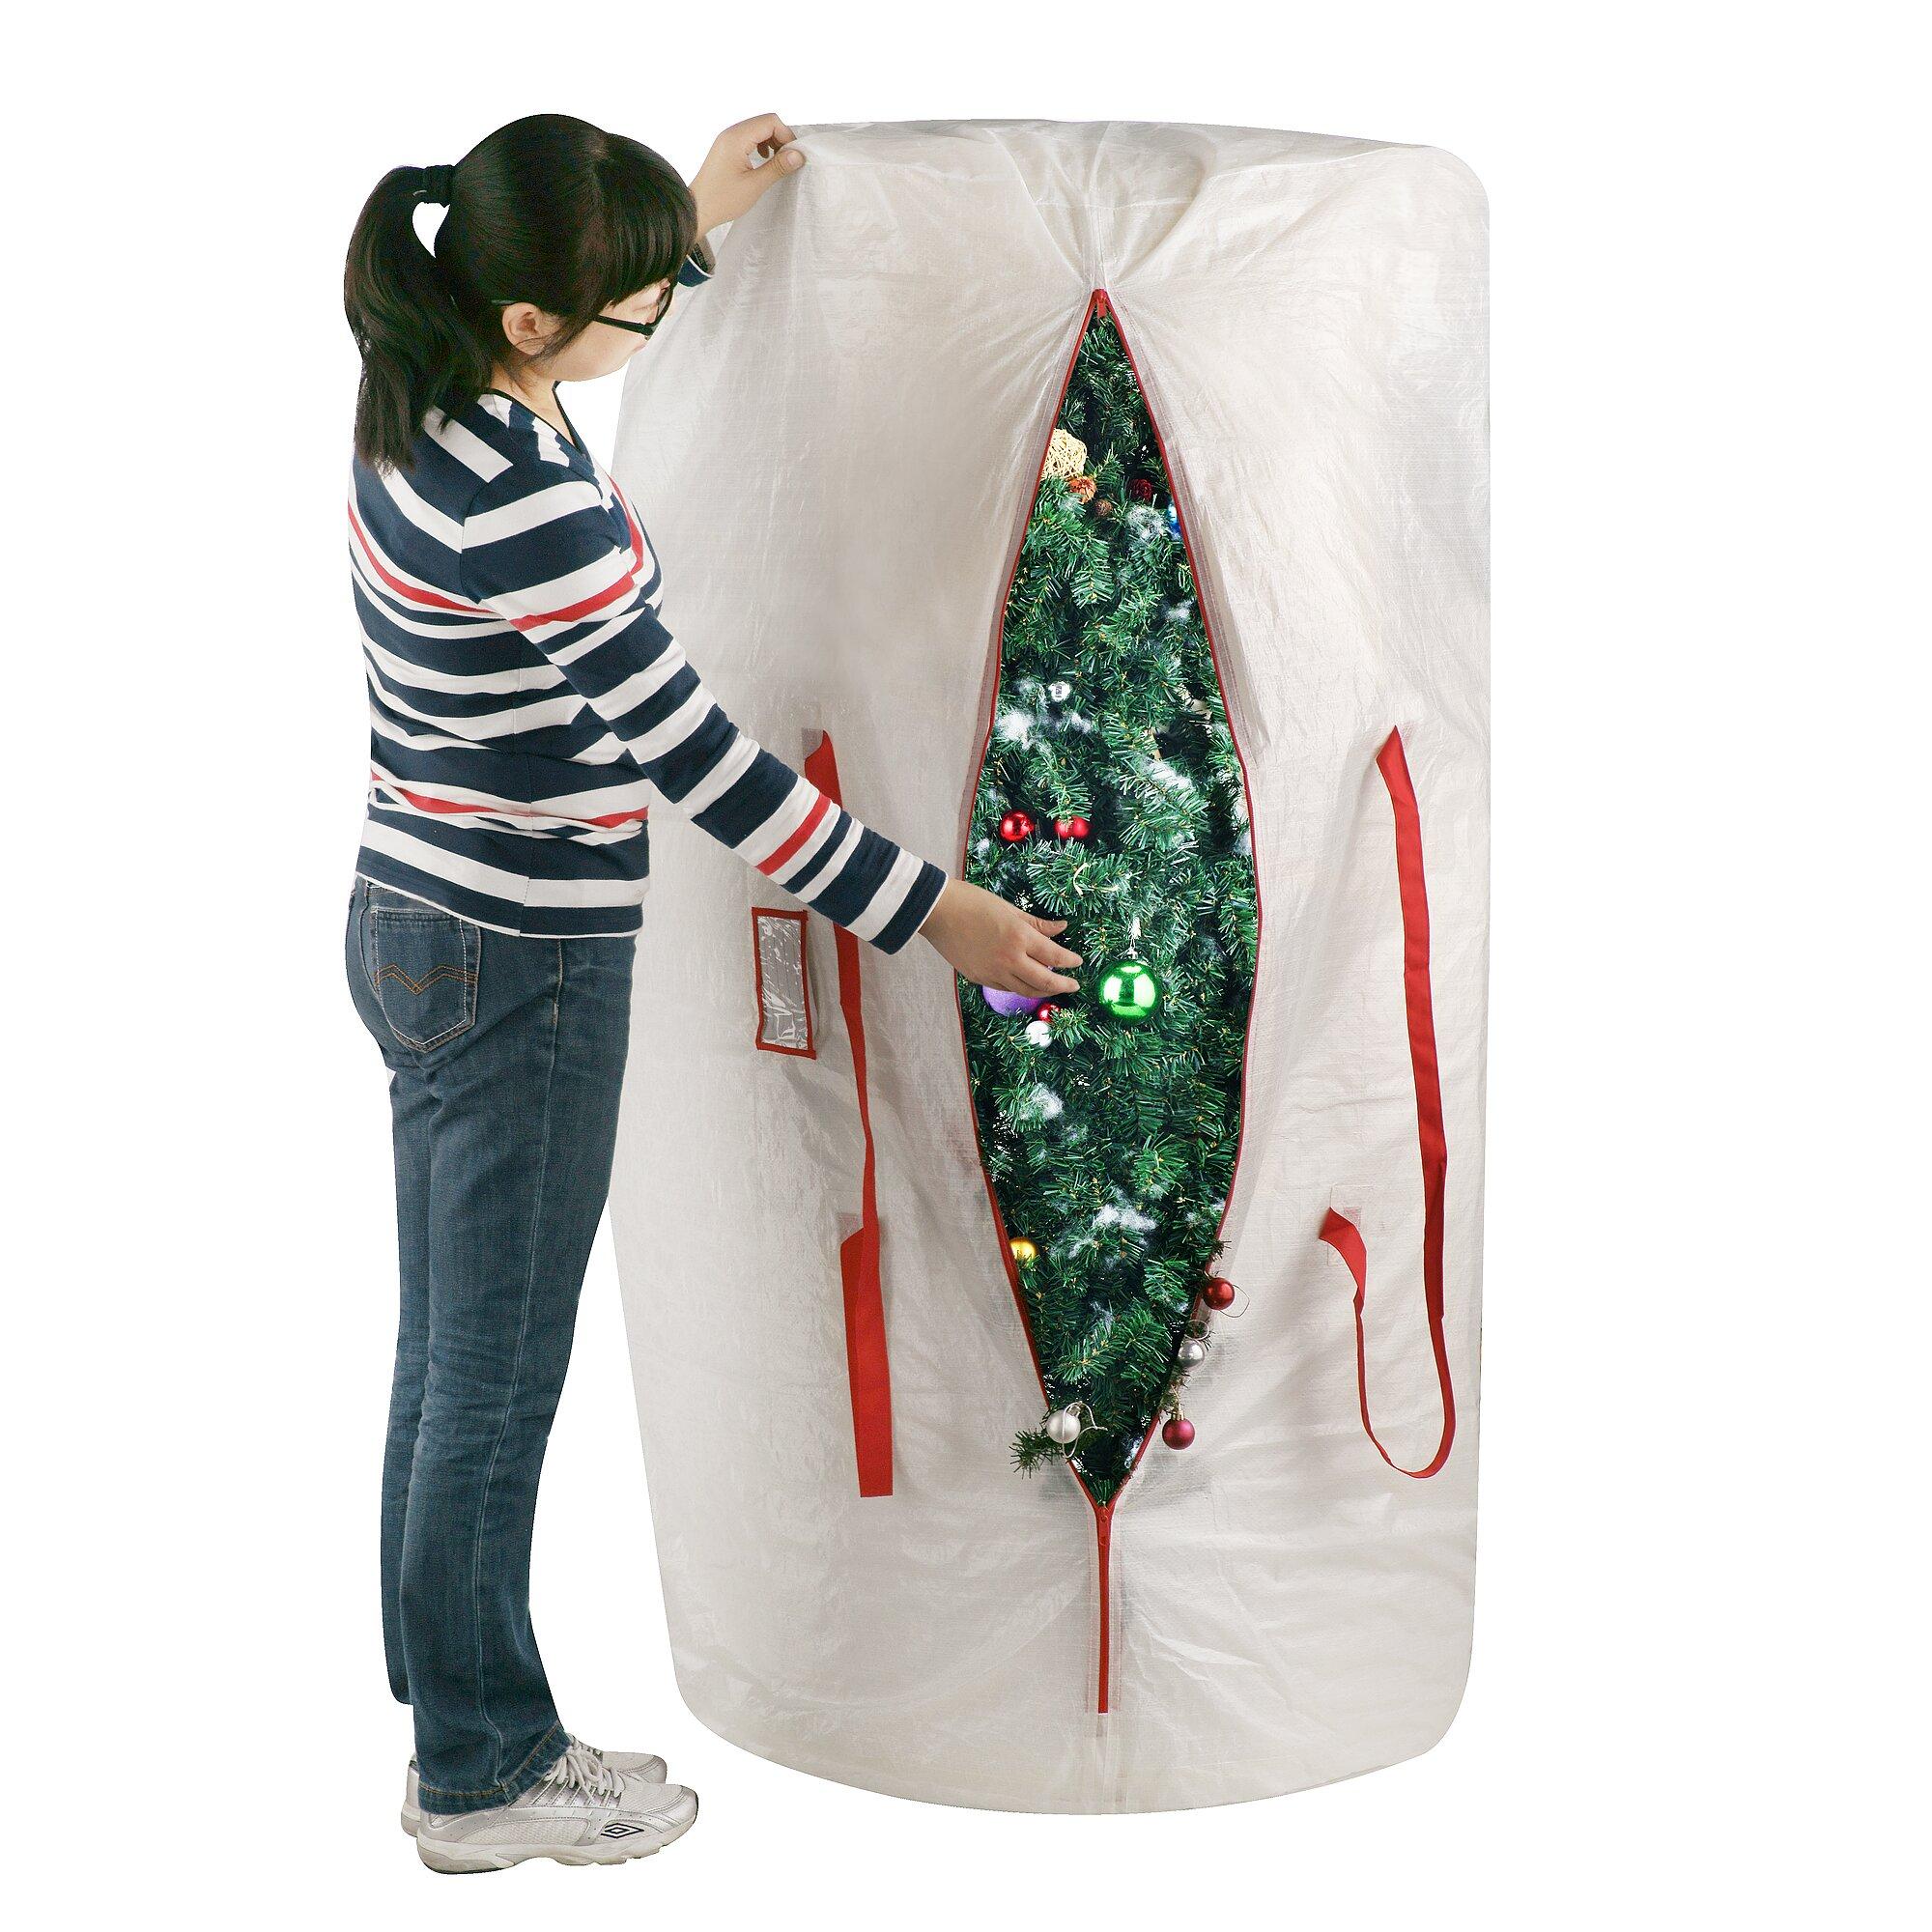 Storage bags for christmas trees - Elf Stor Premium Holiday Christmas Tree Storage Bag